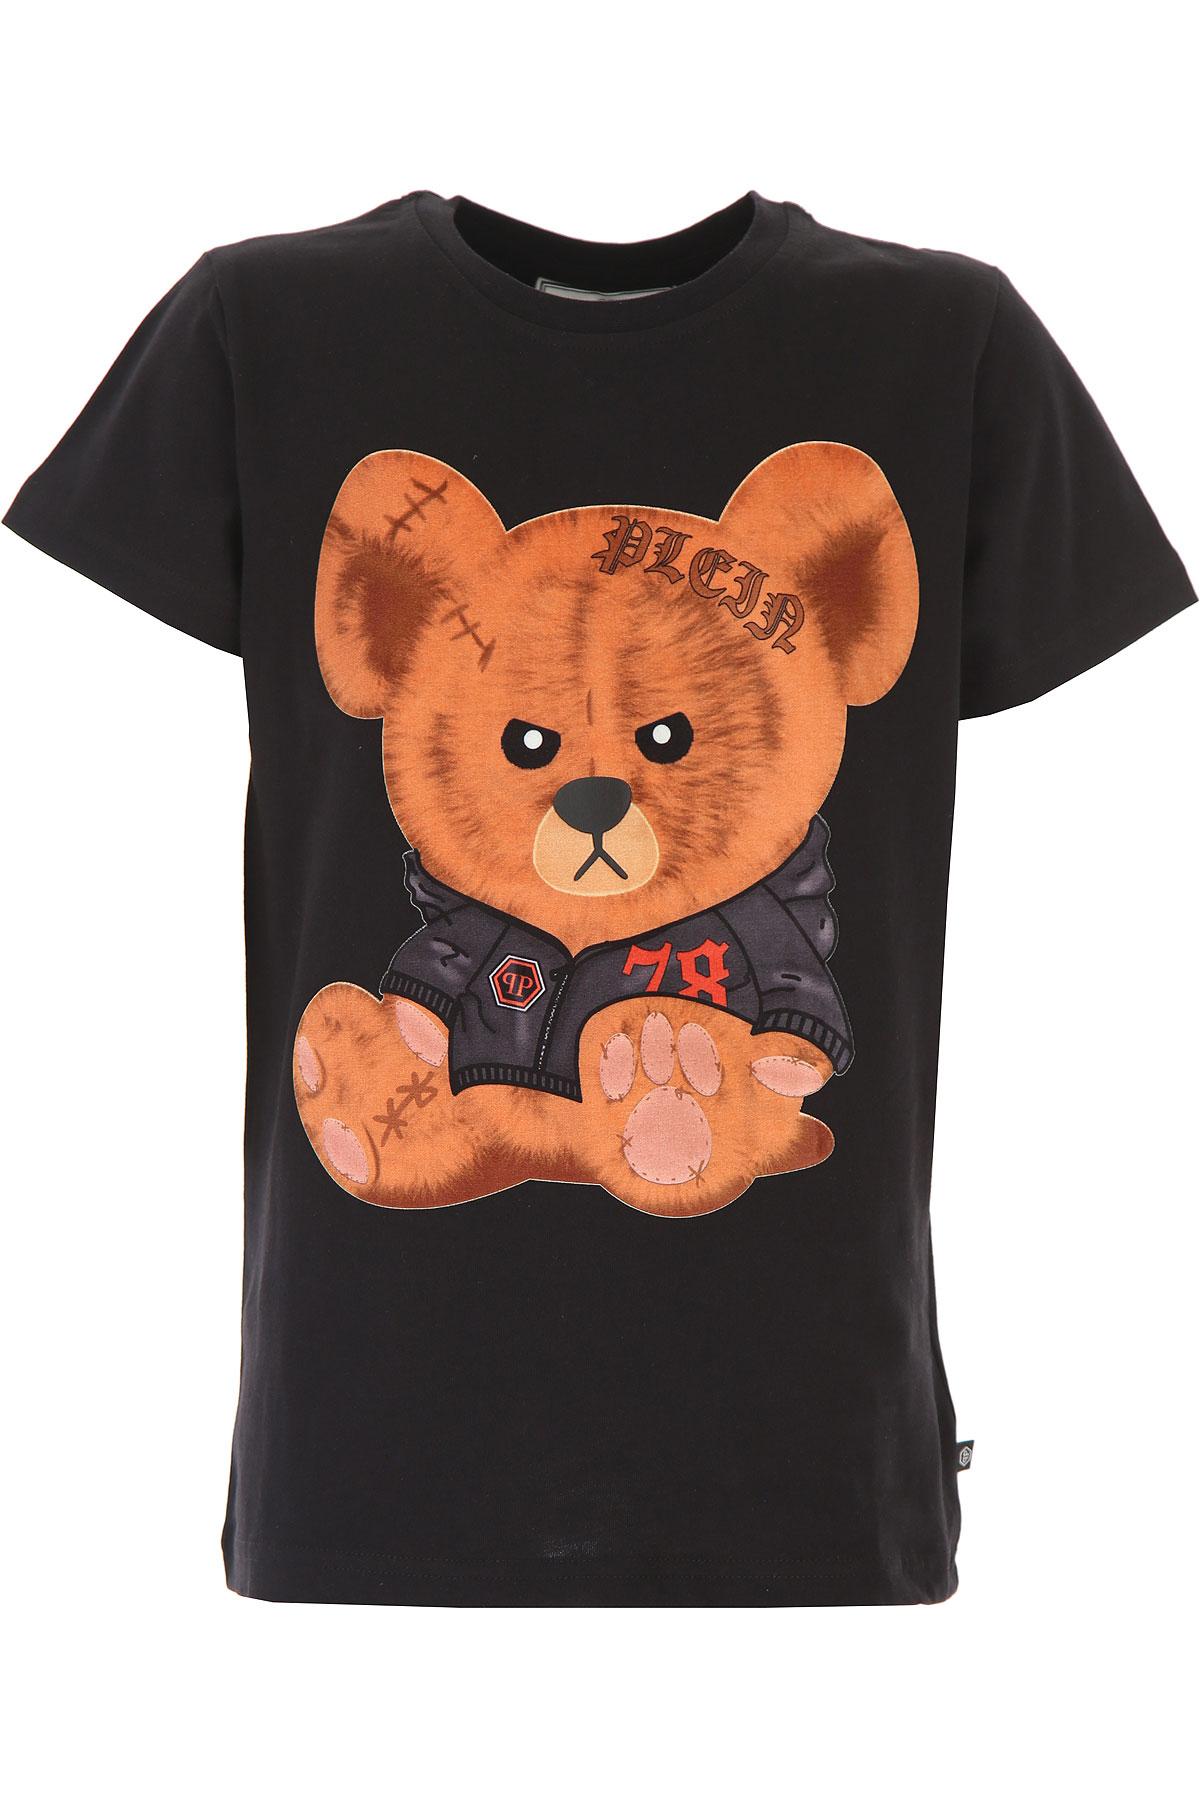 Philipp Plein Kids T-Shirt for Boys On Sale, Black, Cotton, 2019, 14Y 16Y